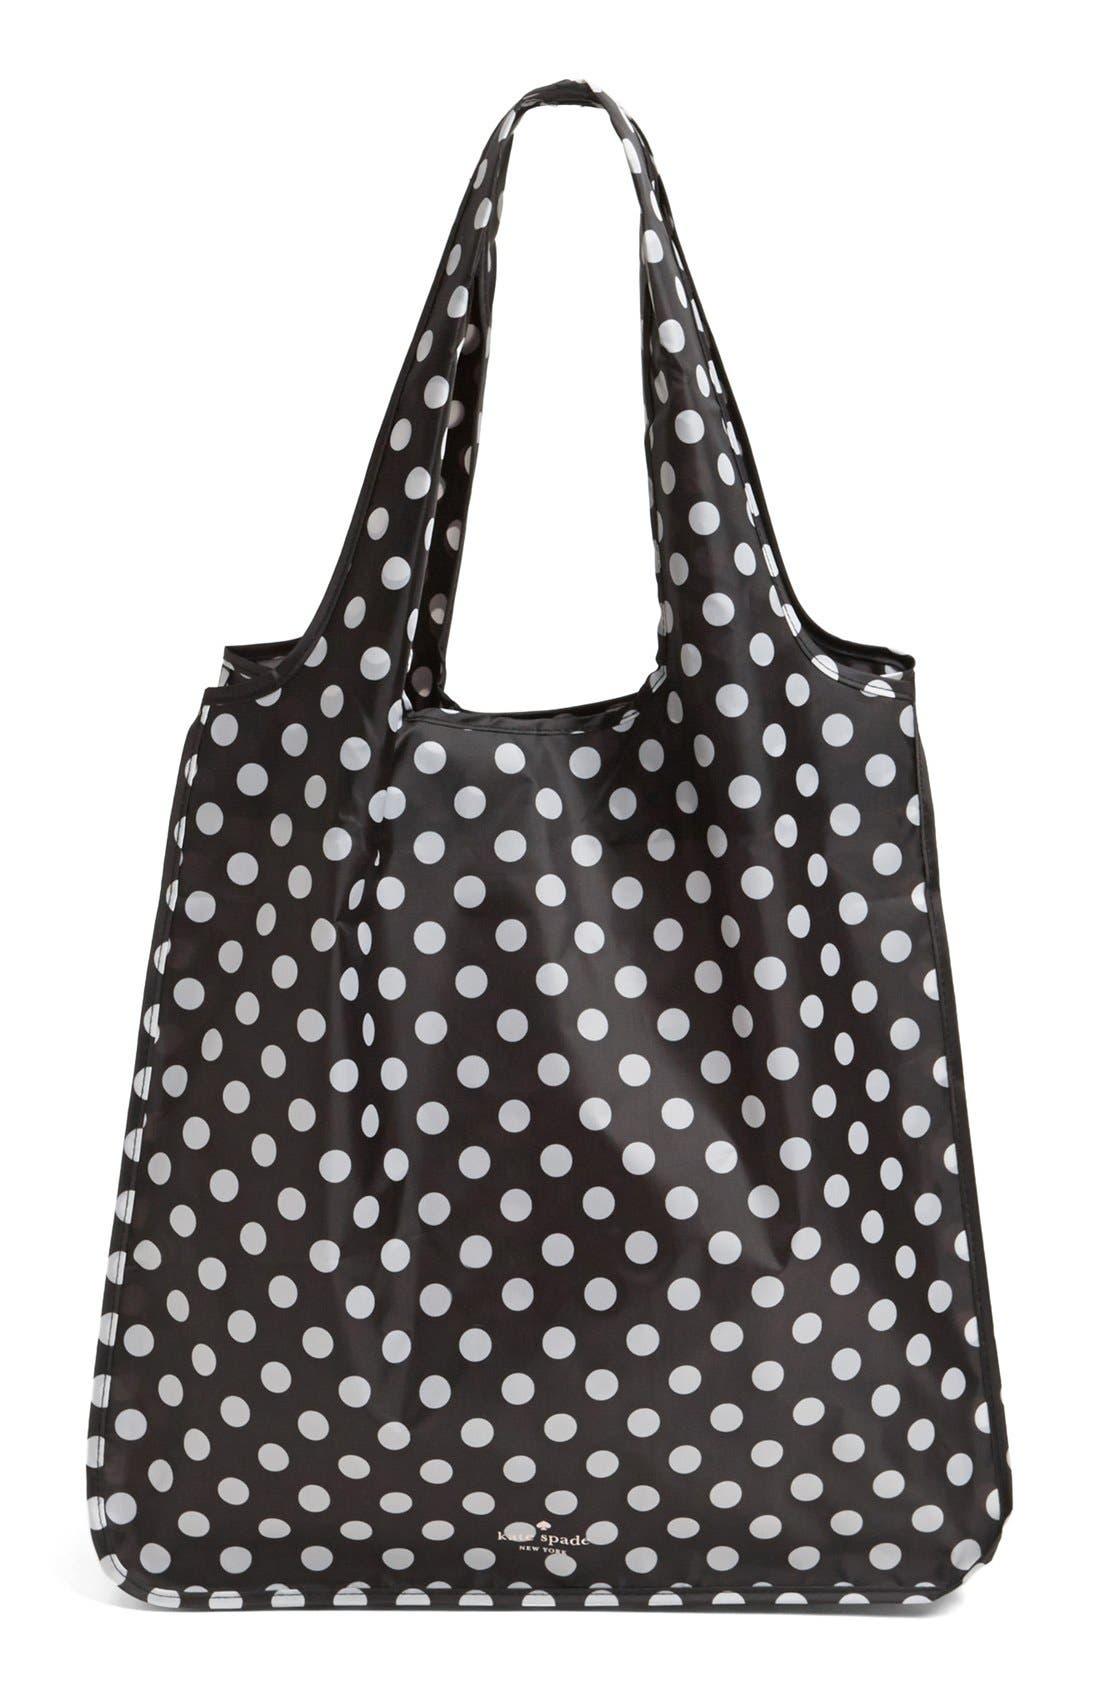 KATE SPADE NEW YORK polka dot reusable shopping tote